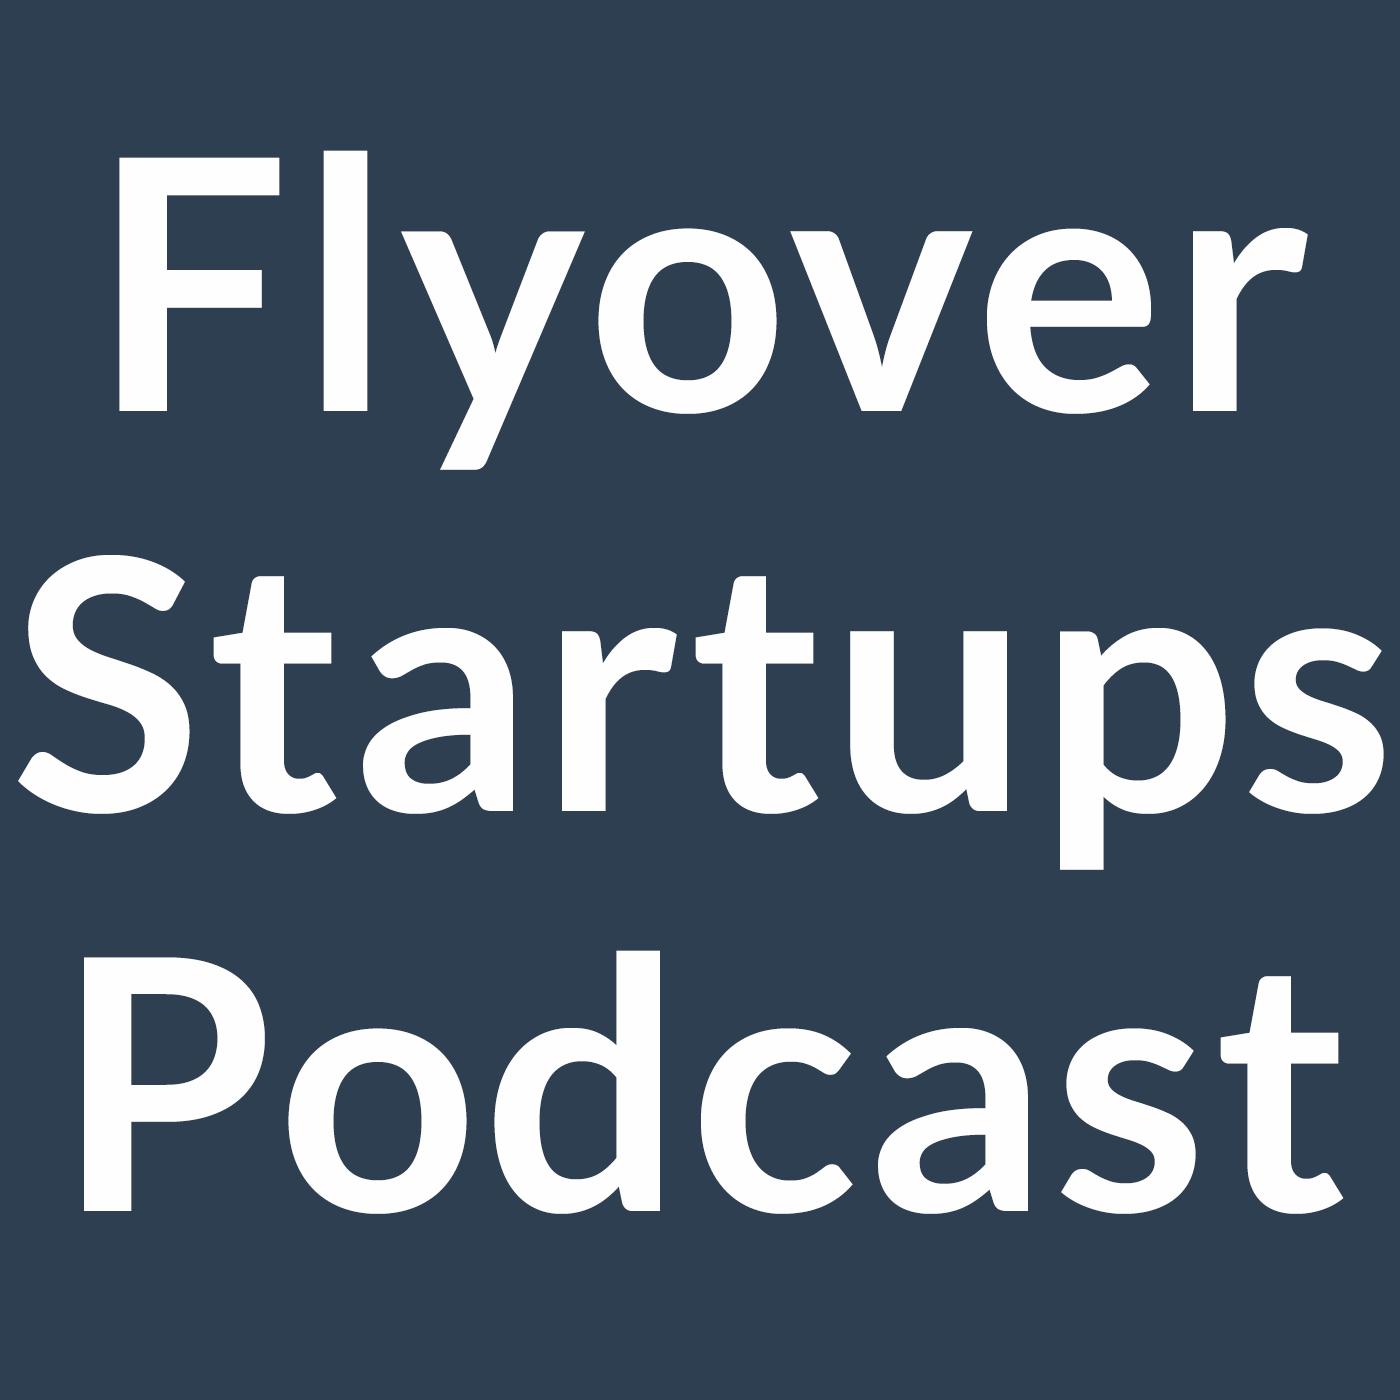 Flyover Startups Podcast